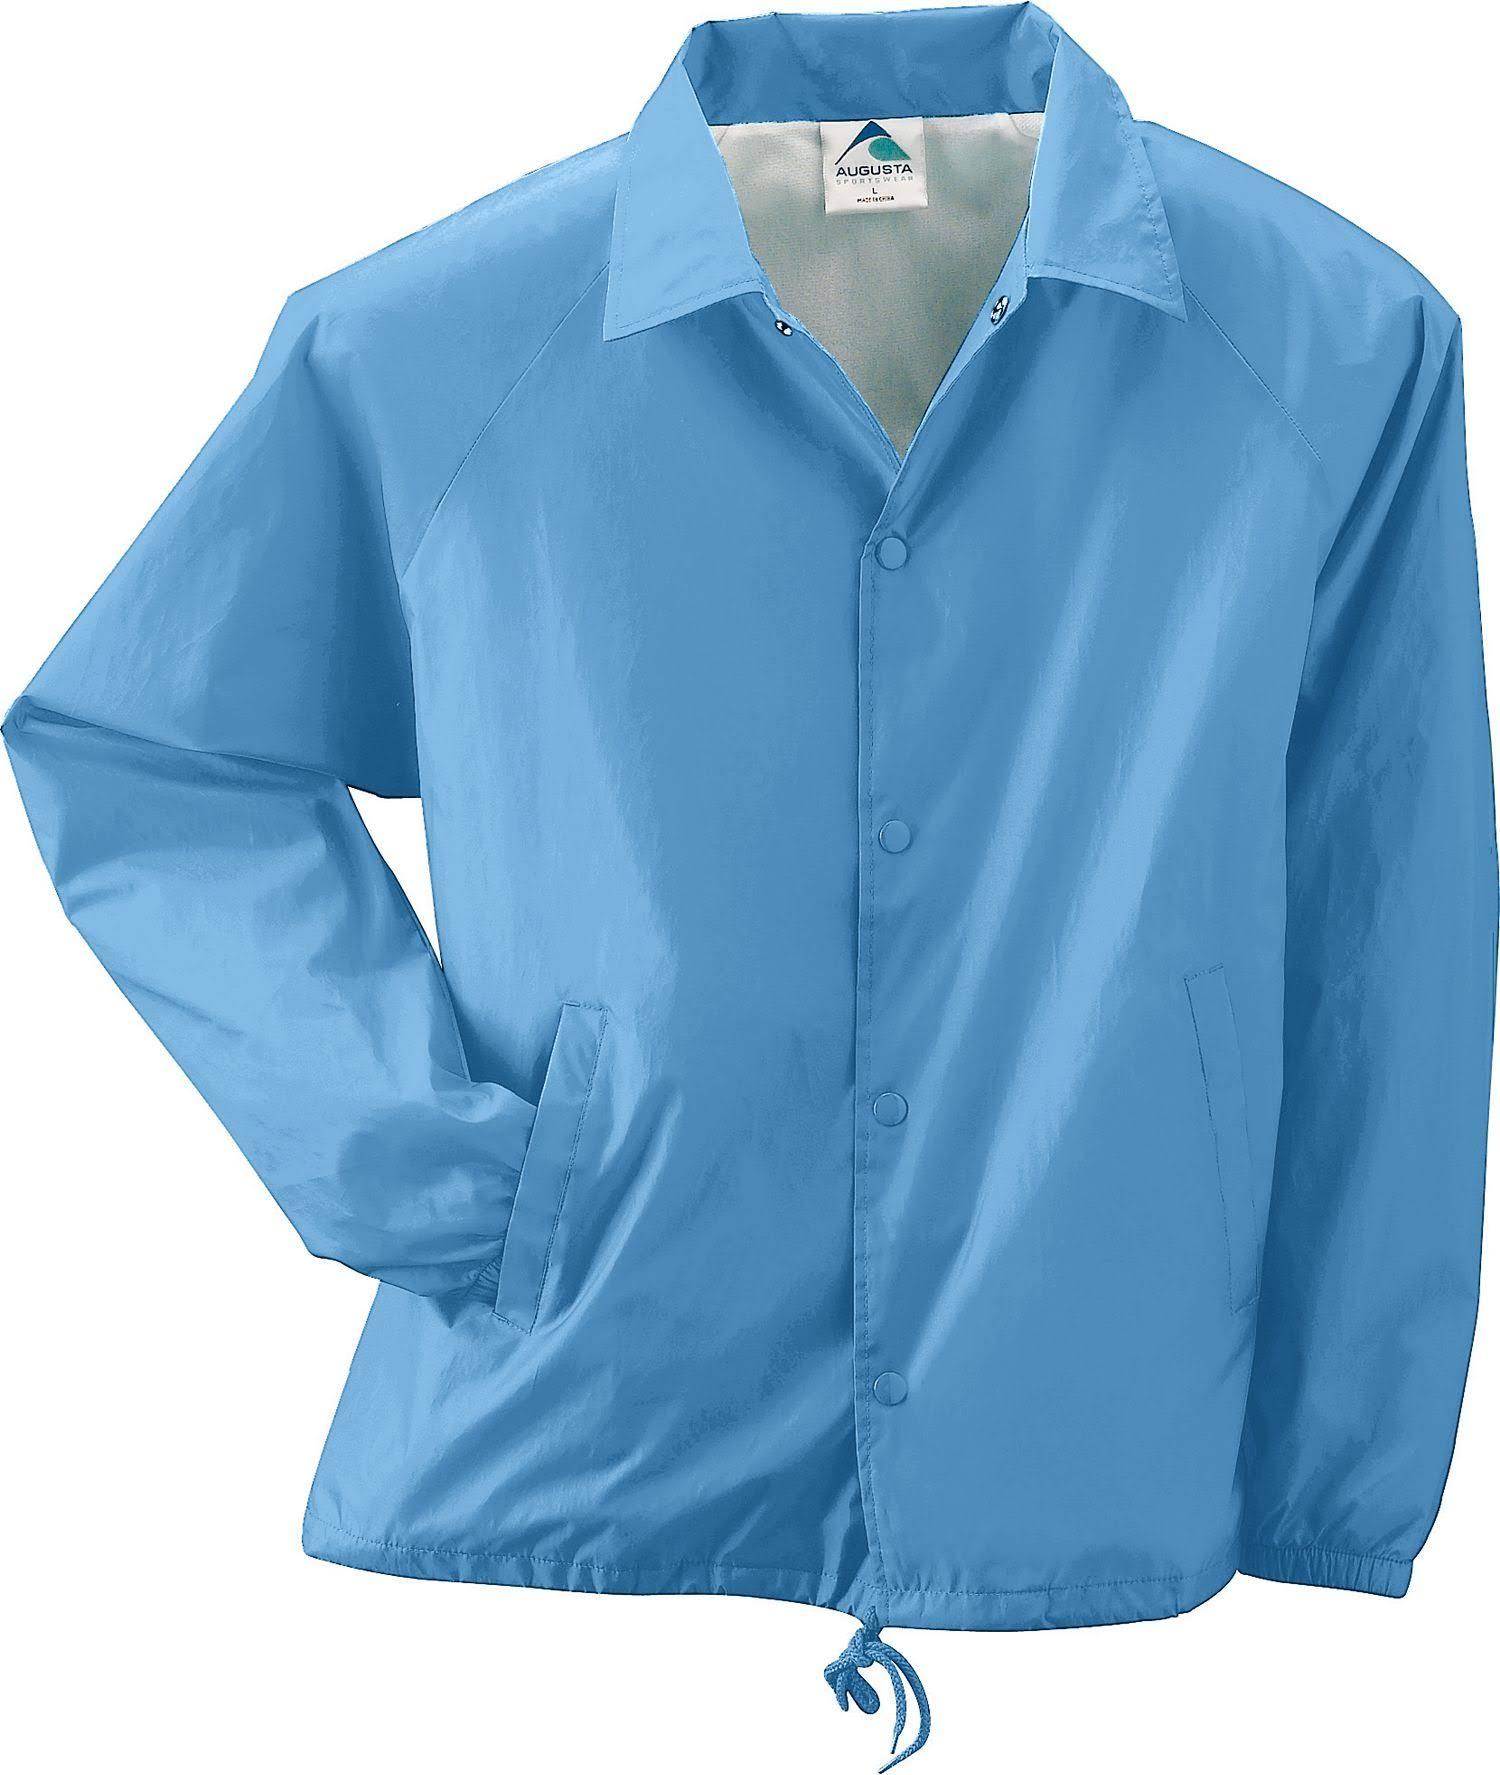 Augusta Blue Coachs 3100 Sportswear Nylon L Forrada Chaqueta Columbia qazBqr